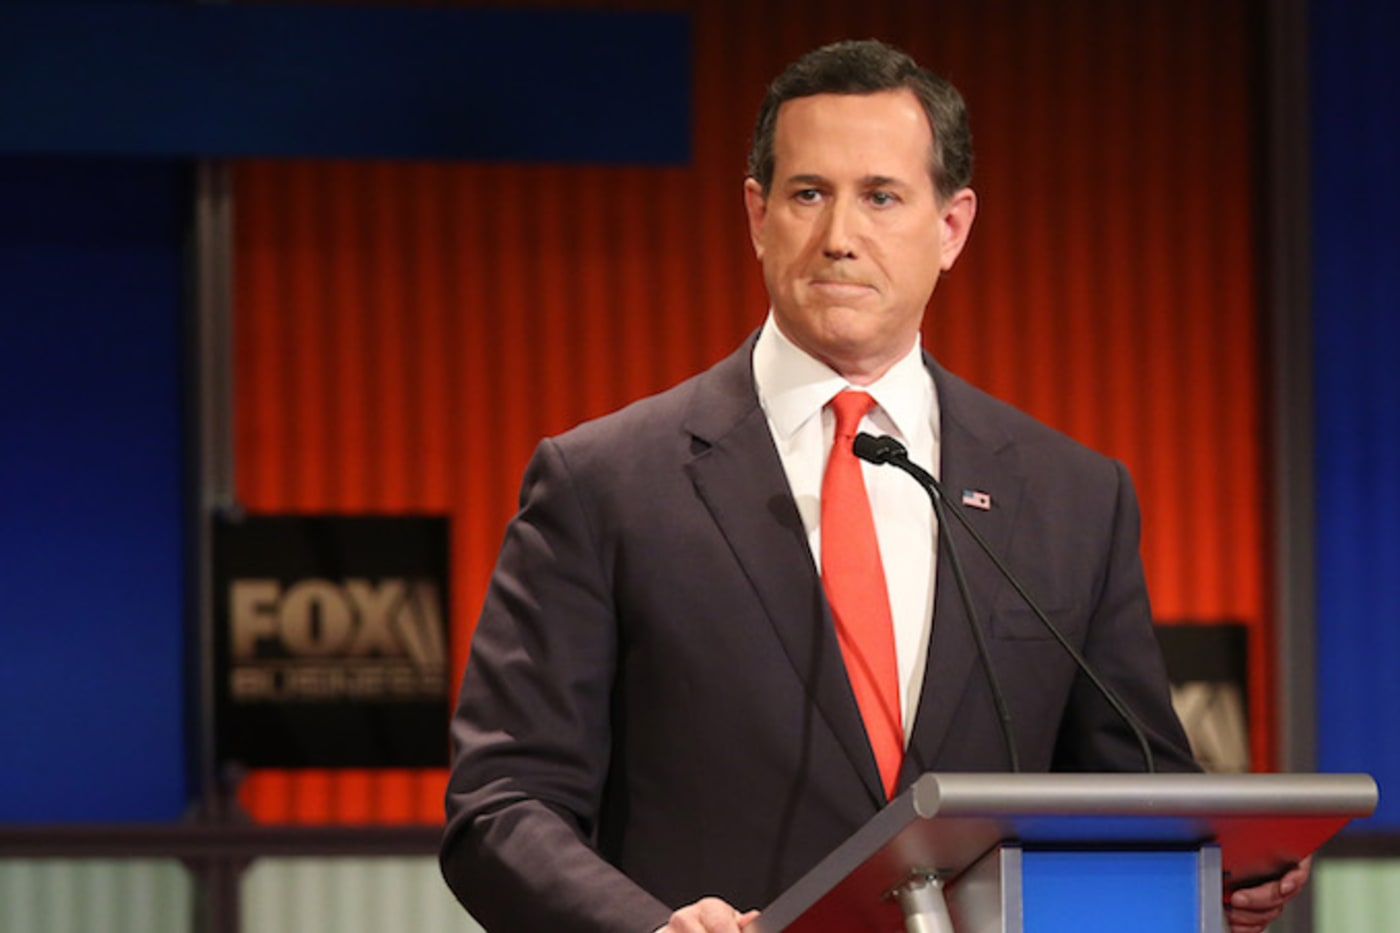 Rick Santorum at a presidential debate